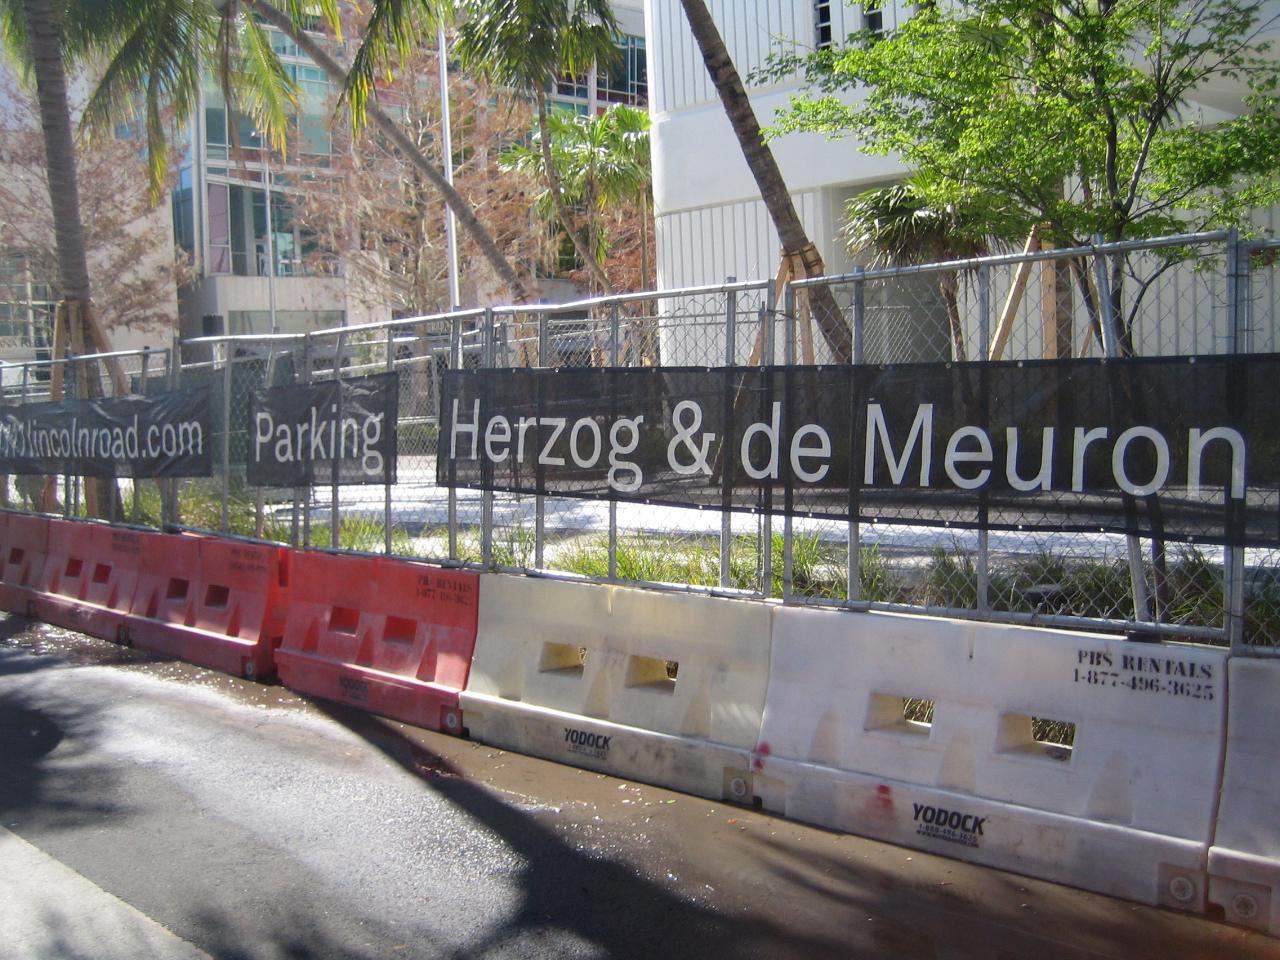 miami Herzog de Meuron Parking Garage sign